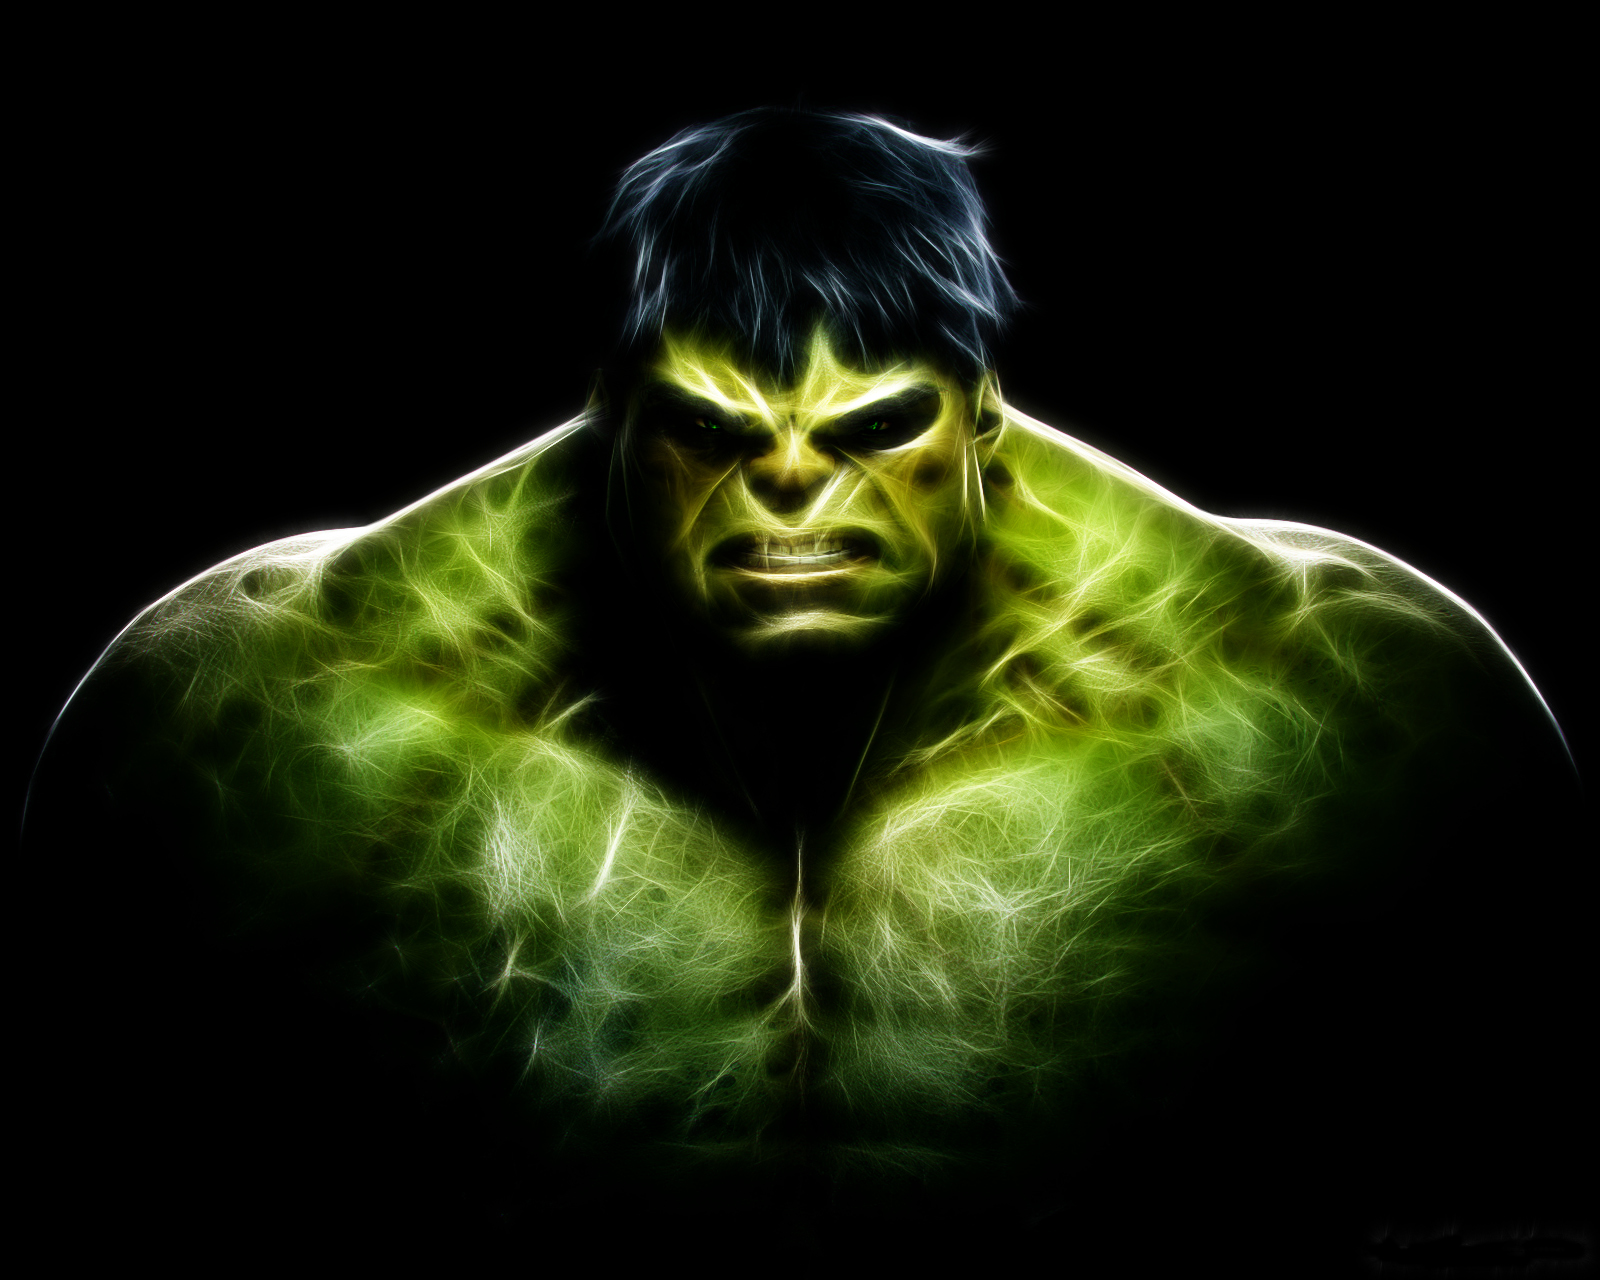 Kaliteli Resim The Hulk HD Wallpapers Yeil Dev Duvar Katlar 1600x1280